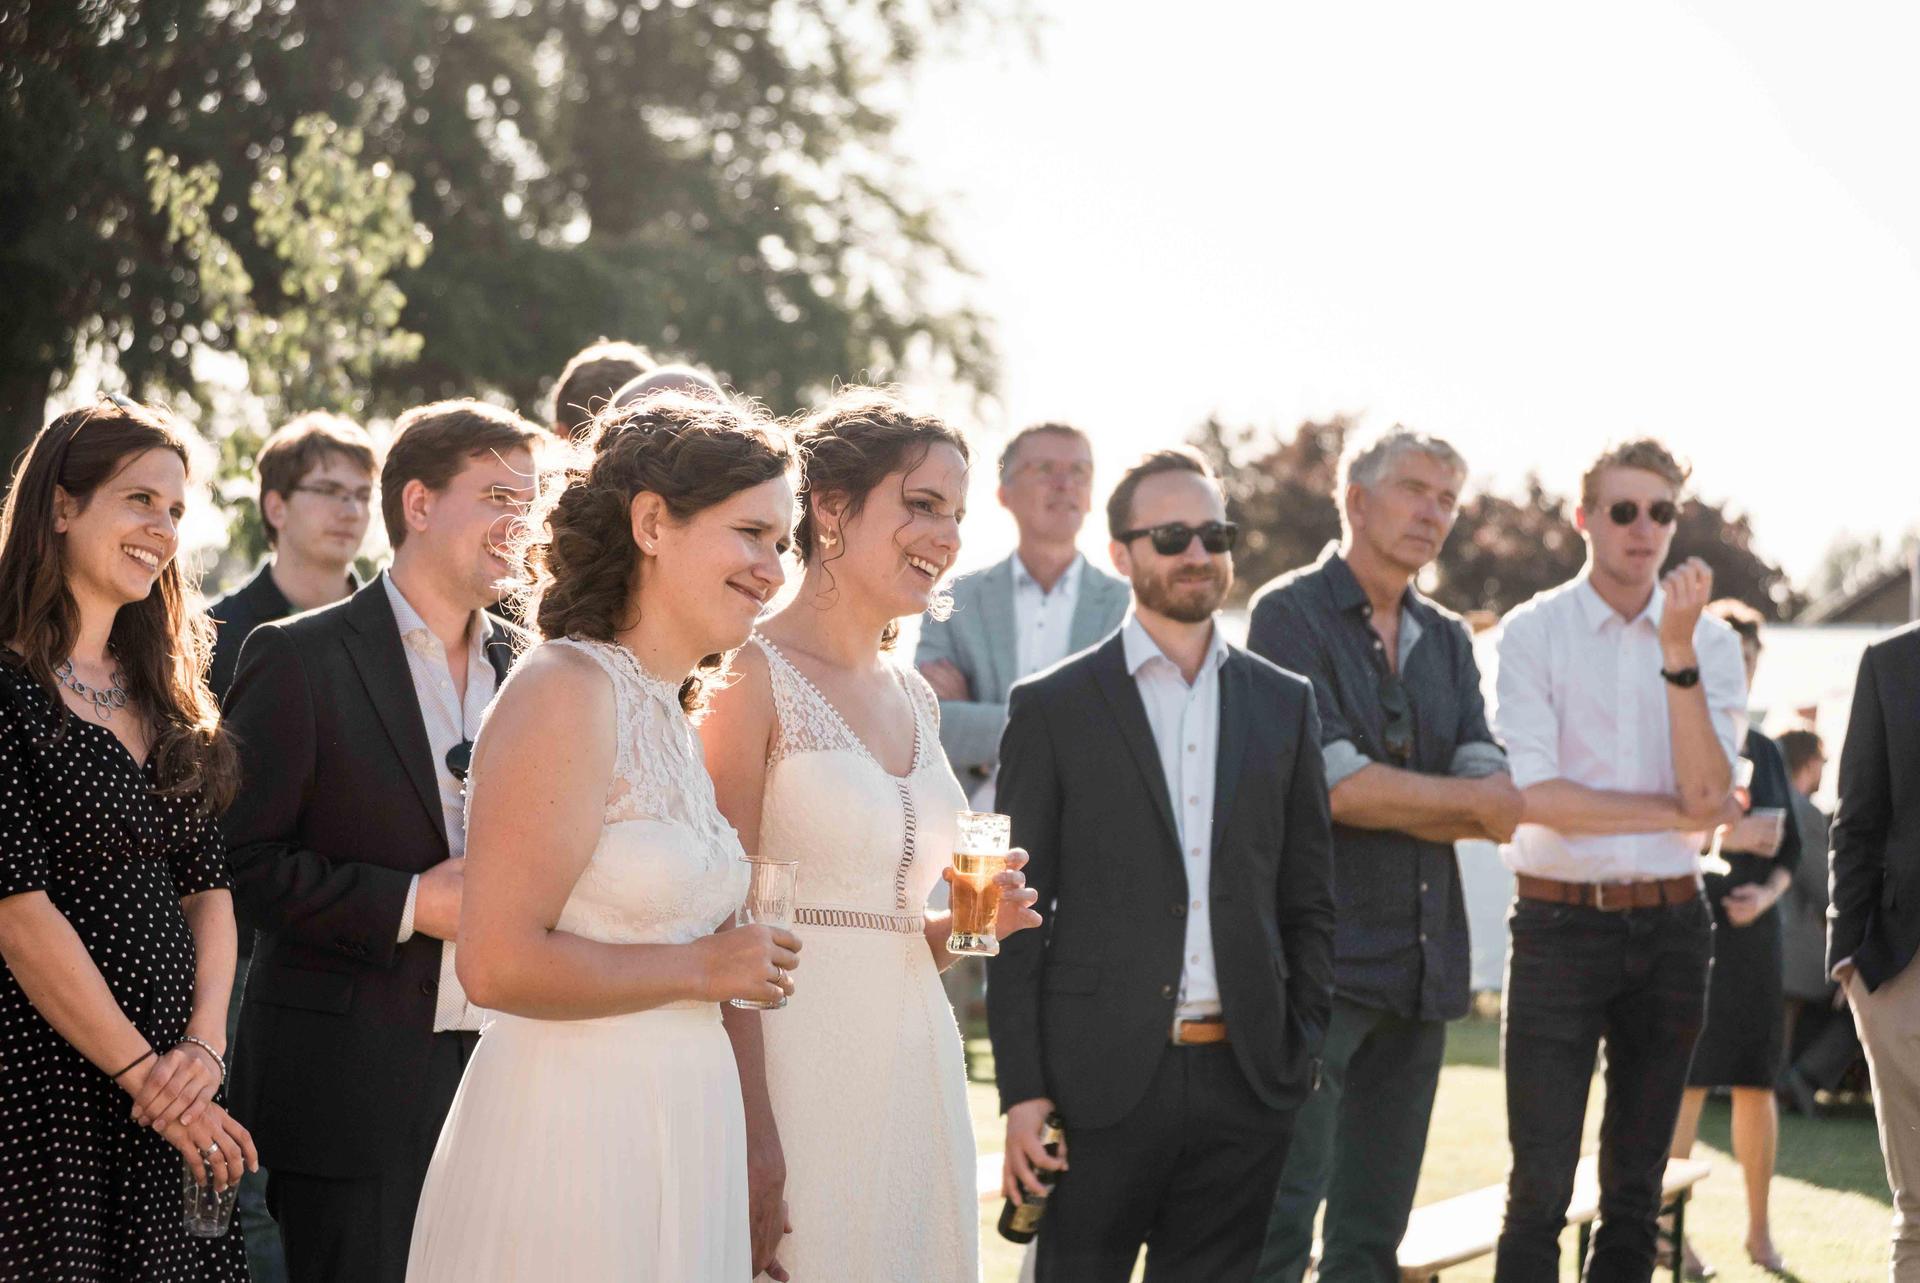 Bruiloft klein website -53.jpg